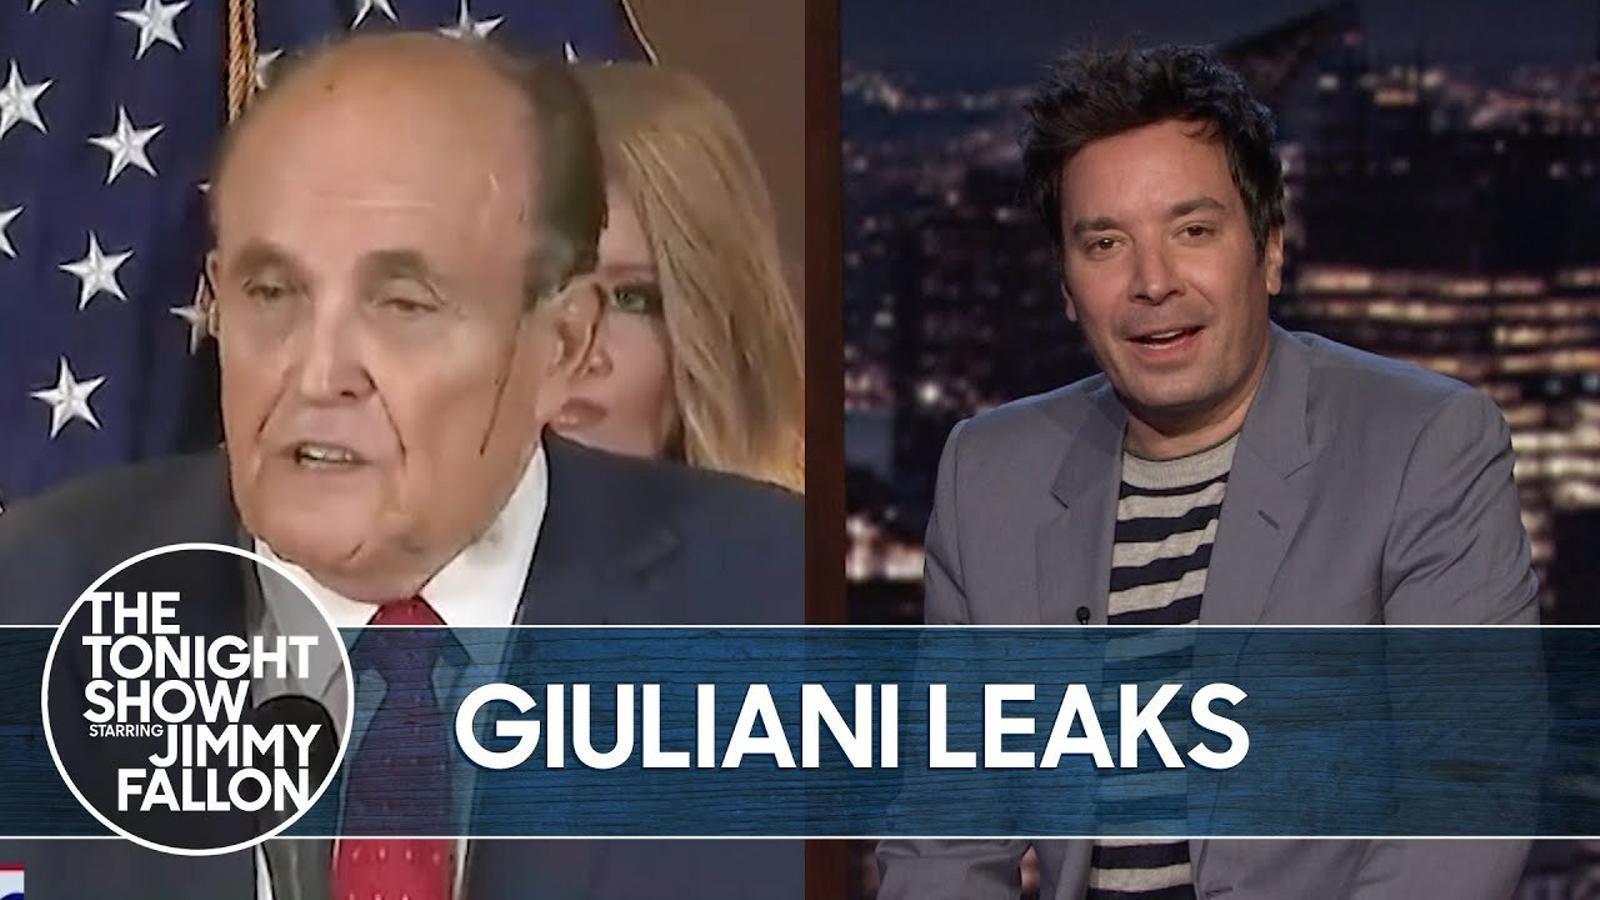 Giuliani, ingressat a l'hospital per covid-19